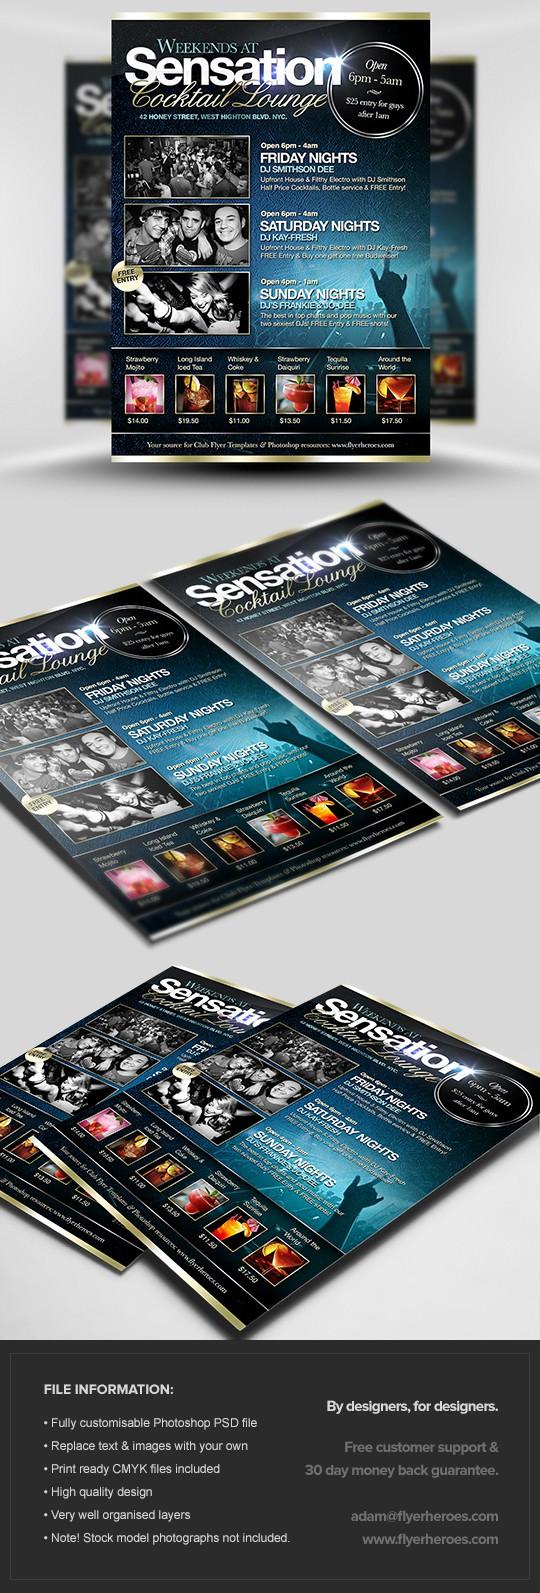 Sensation Cocktail Lounge Flyer Template